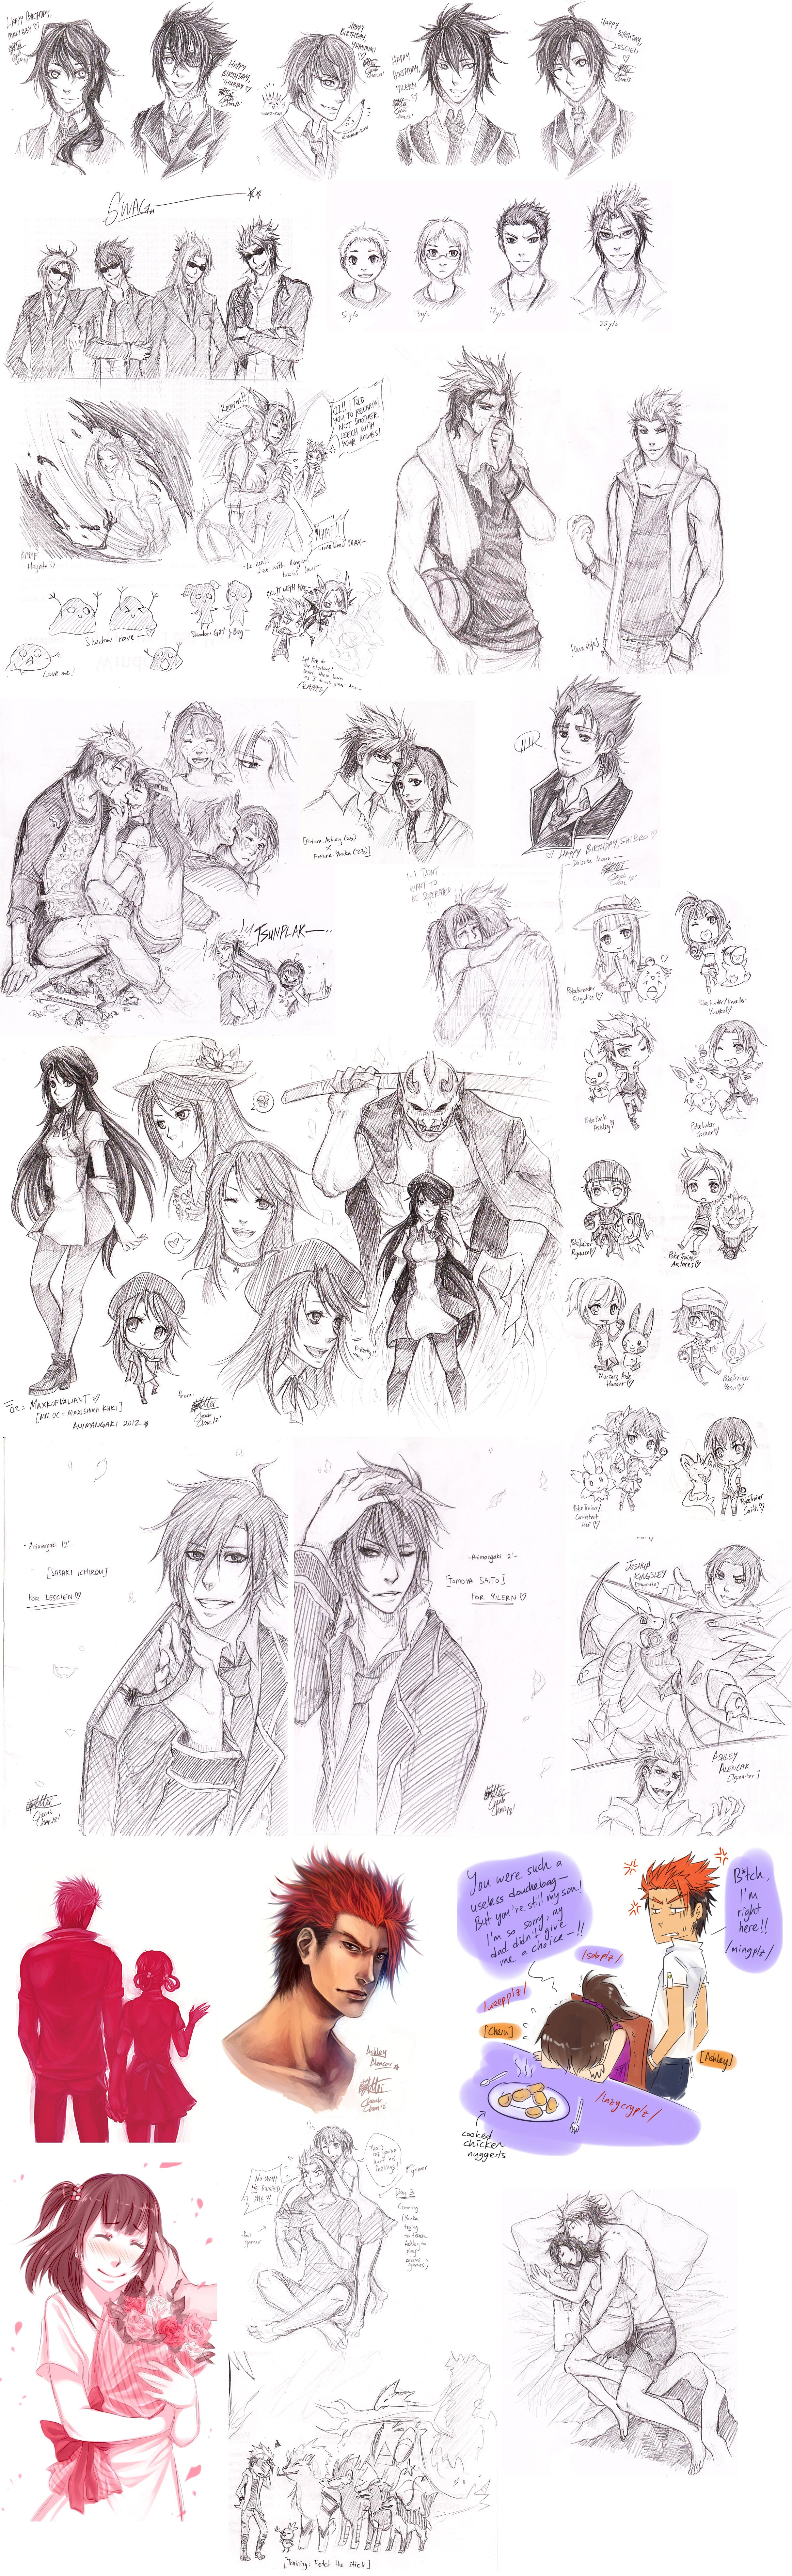 MM Sketchdump 13092012 by cherubchan